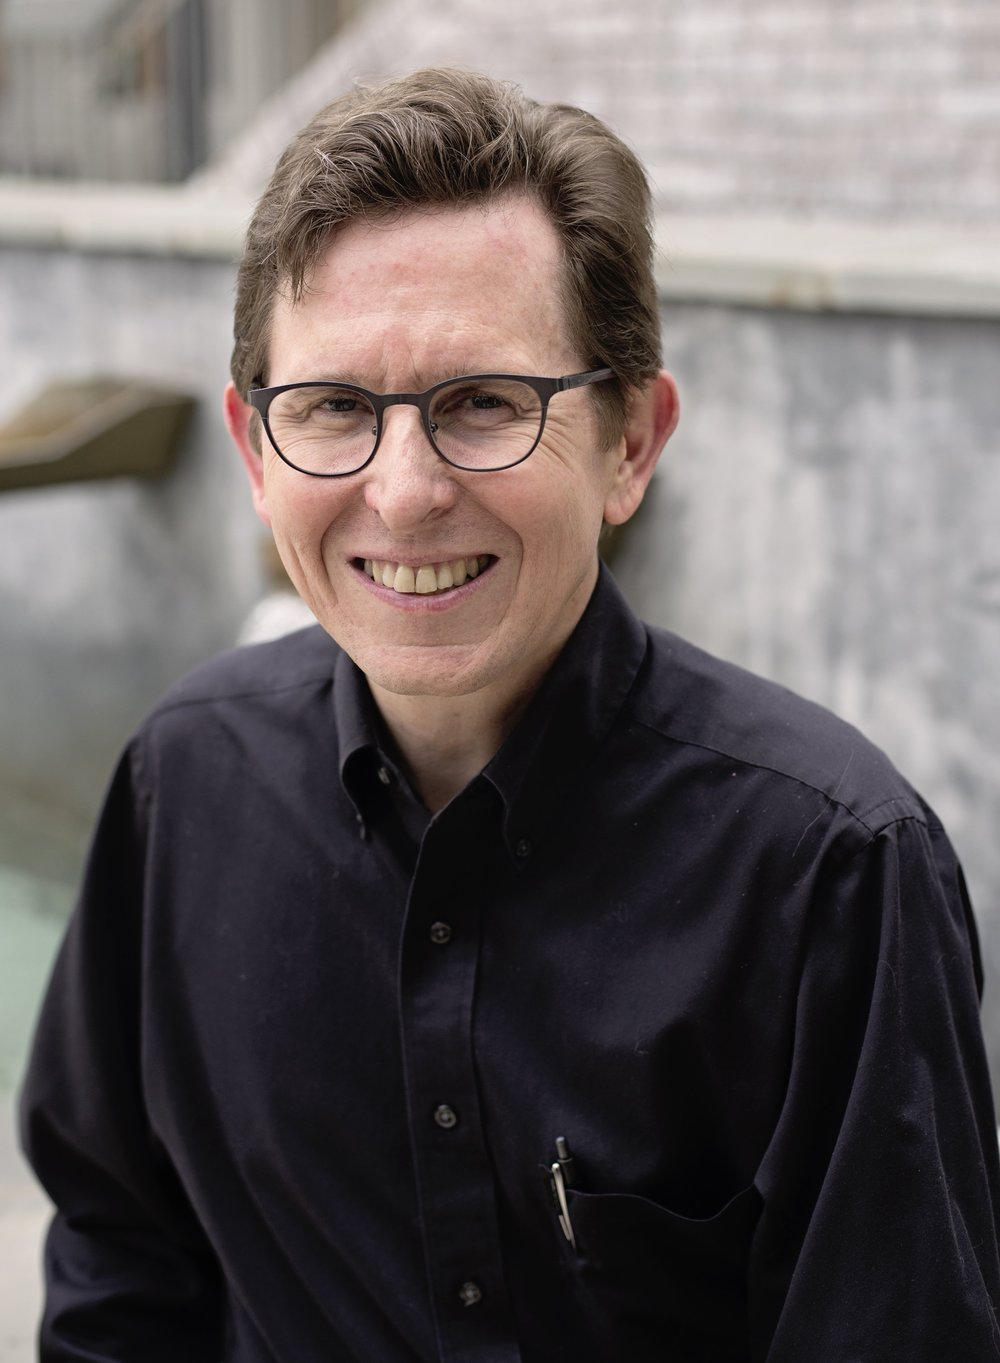 Richard Odom.    C  ertified Optician. ABOC, NCLC